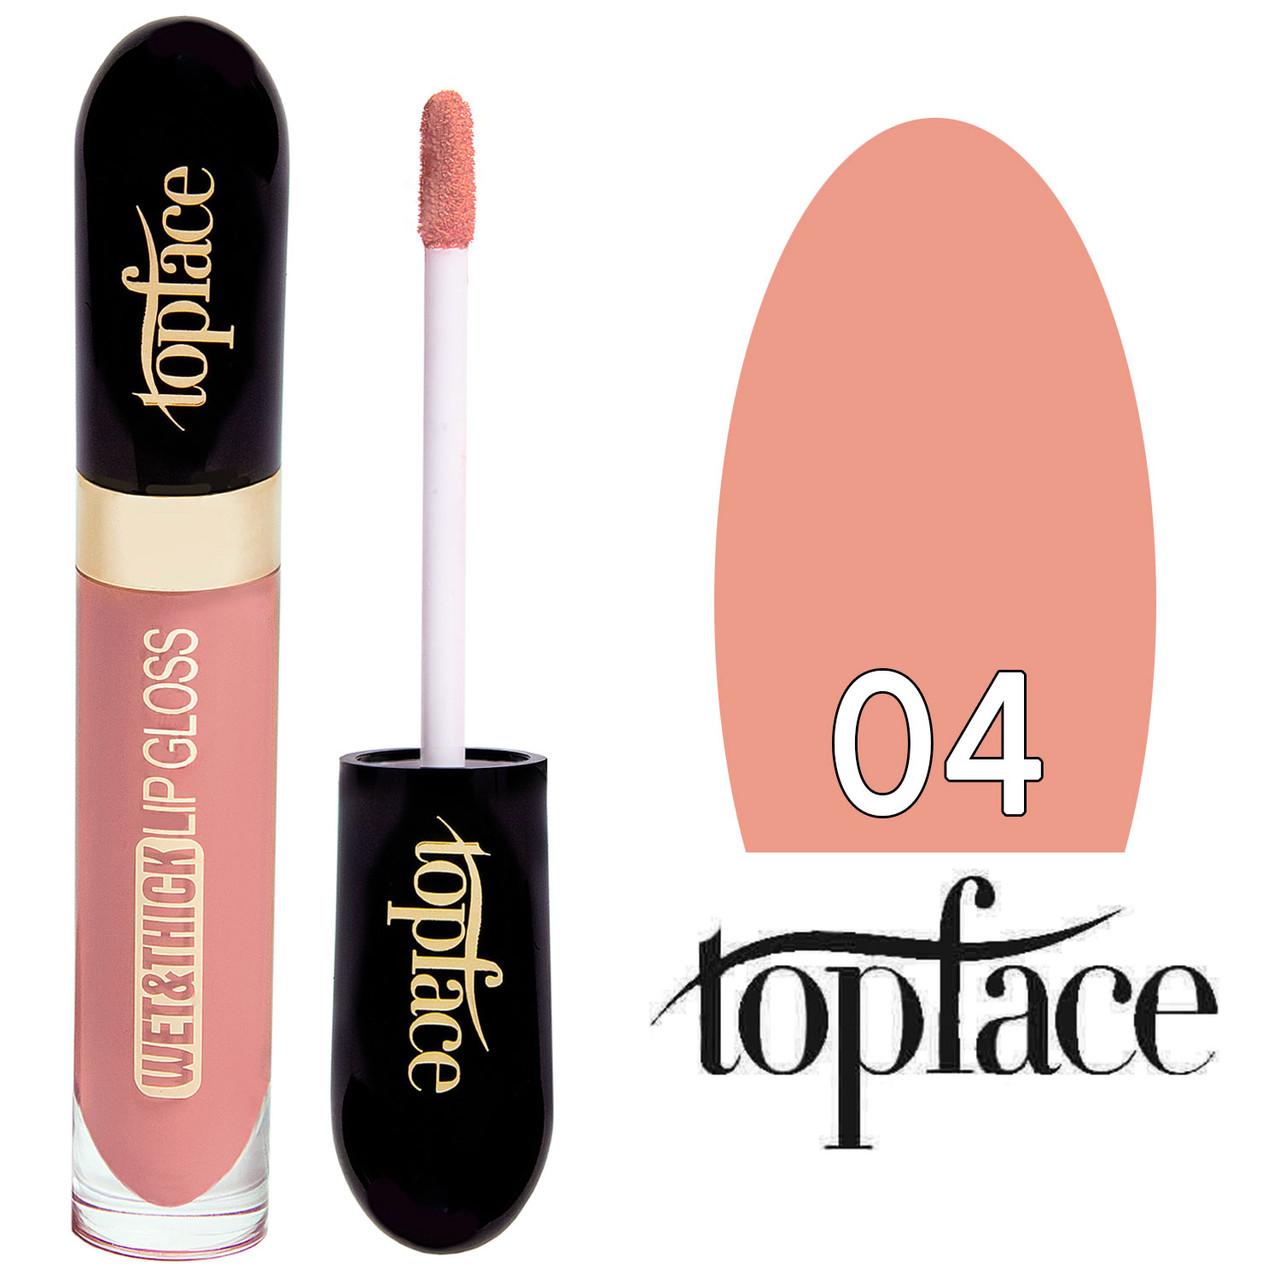 TopFace Блеск для губ Wet&Thick PT-202 Тон №04 peach natural, матовый